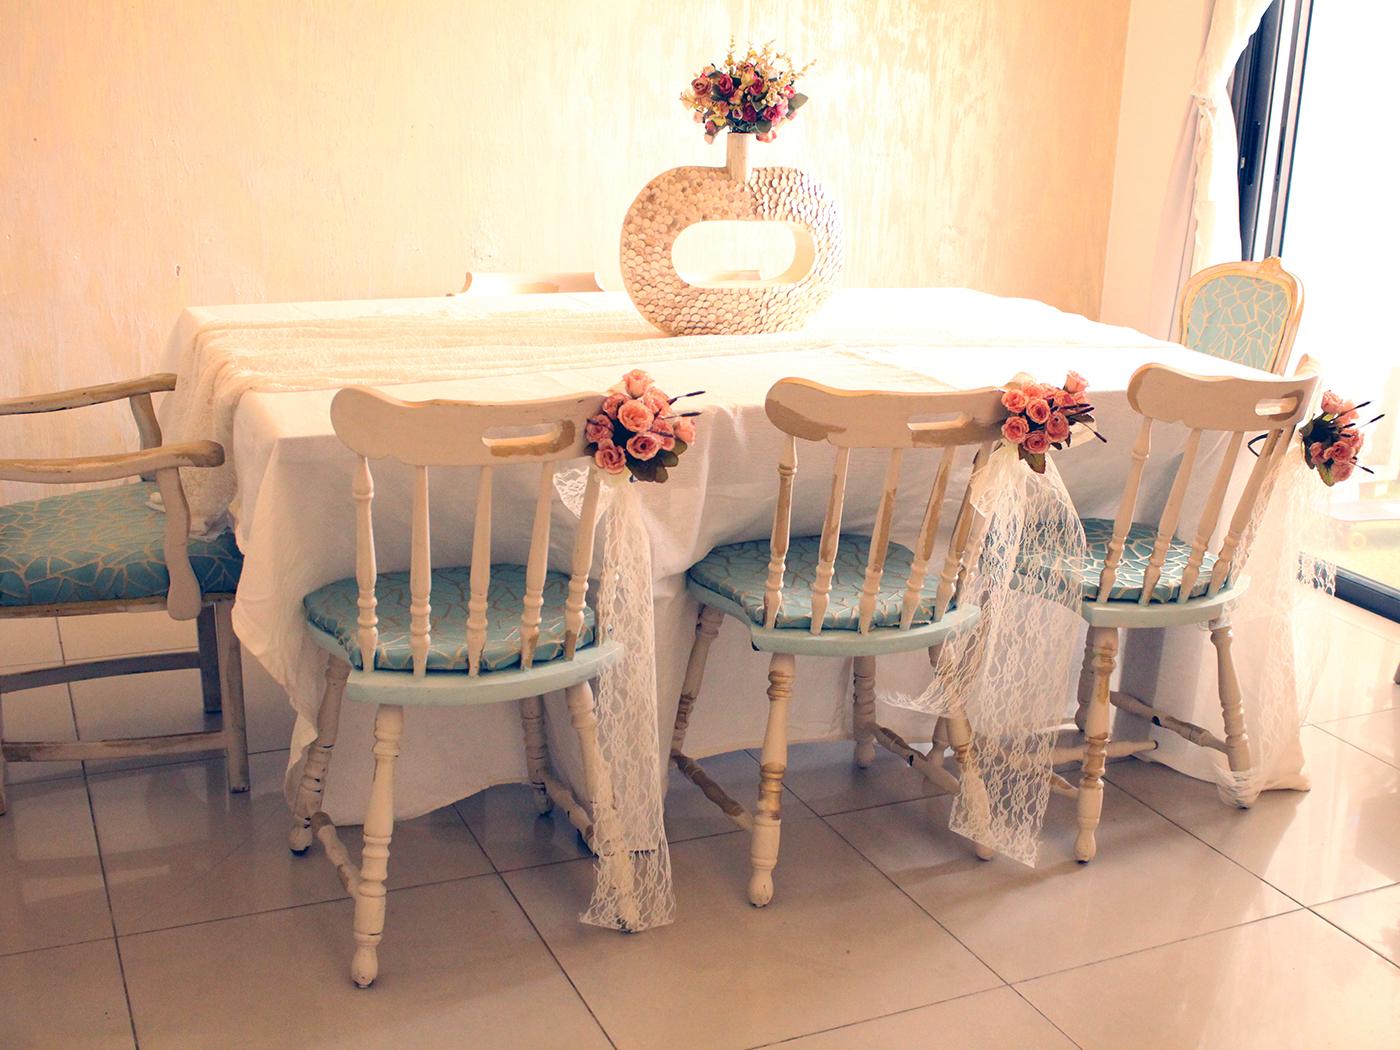 IMG 8070 - חידוש כסאות לפינת אוכל בסלון